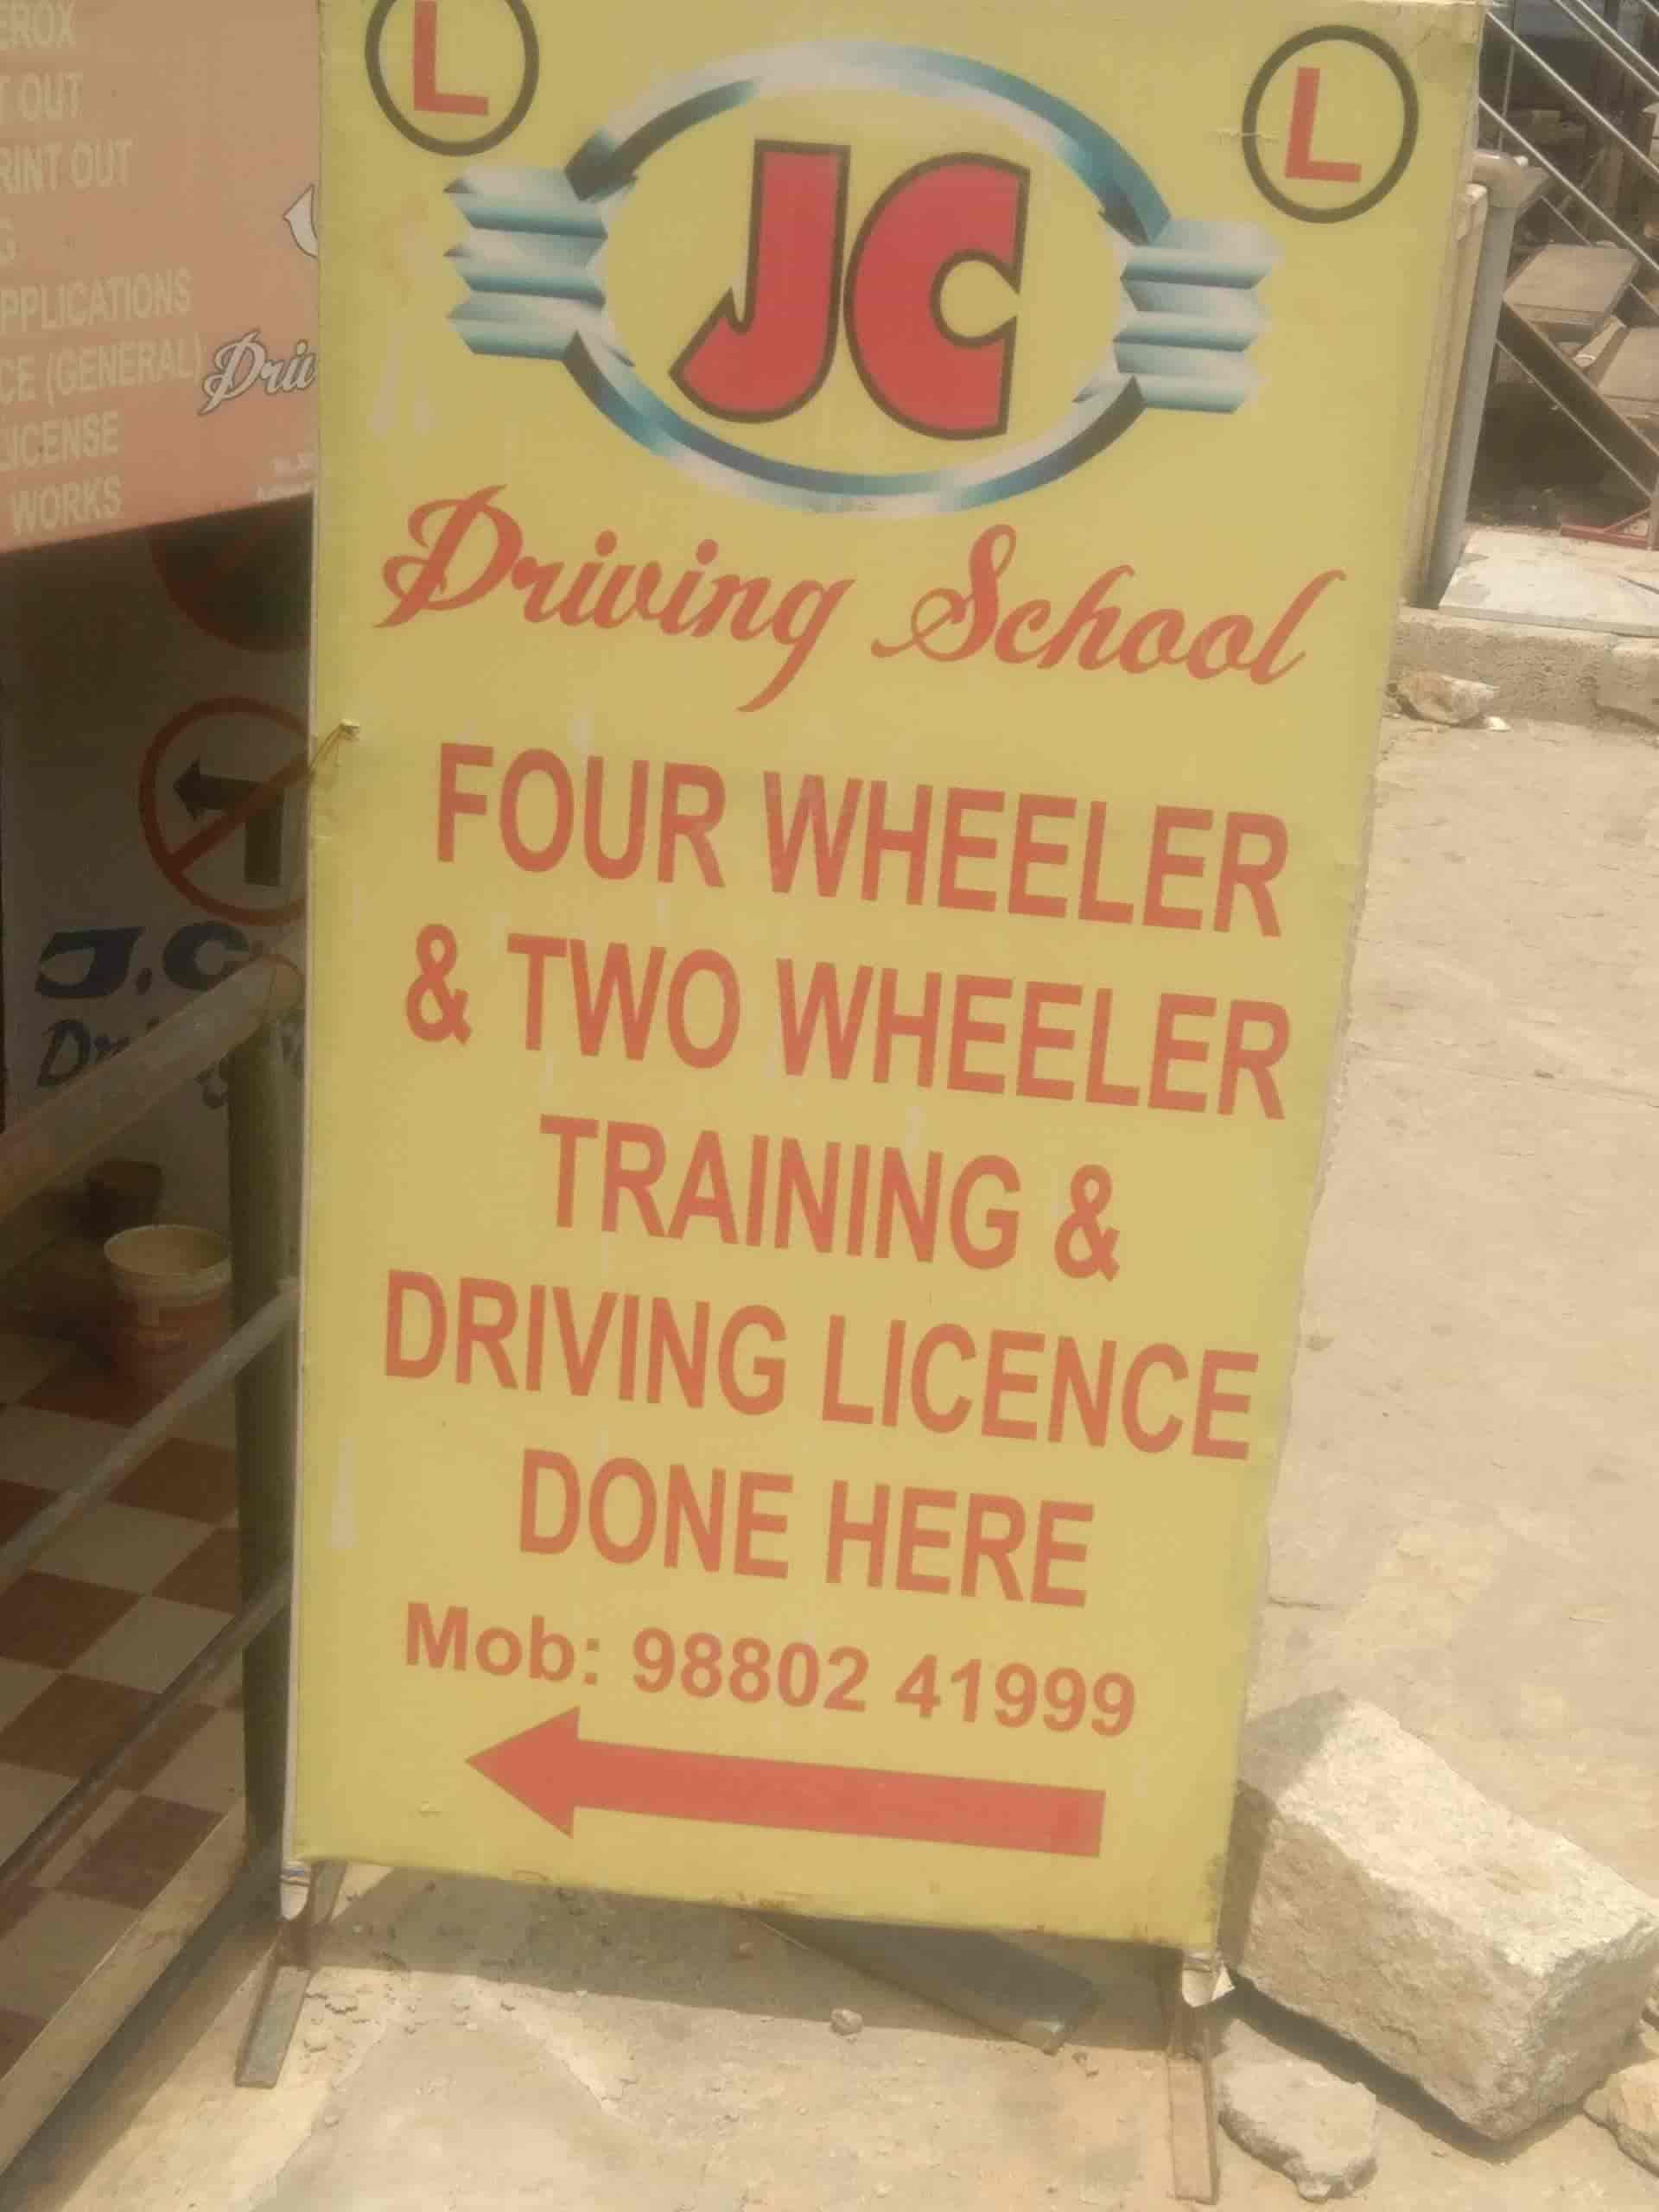 J C Driving School, Kothanur - Motor Training Schools in